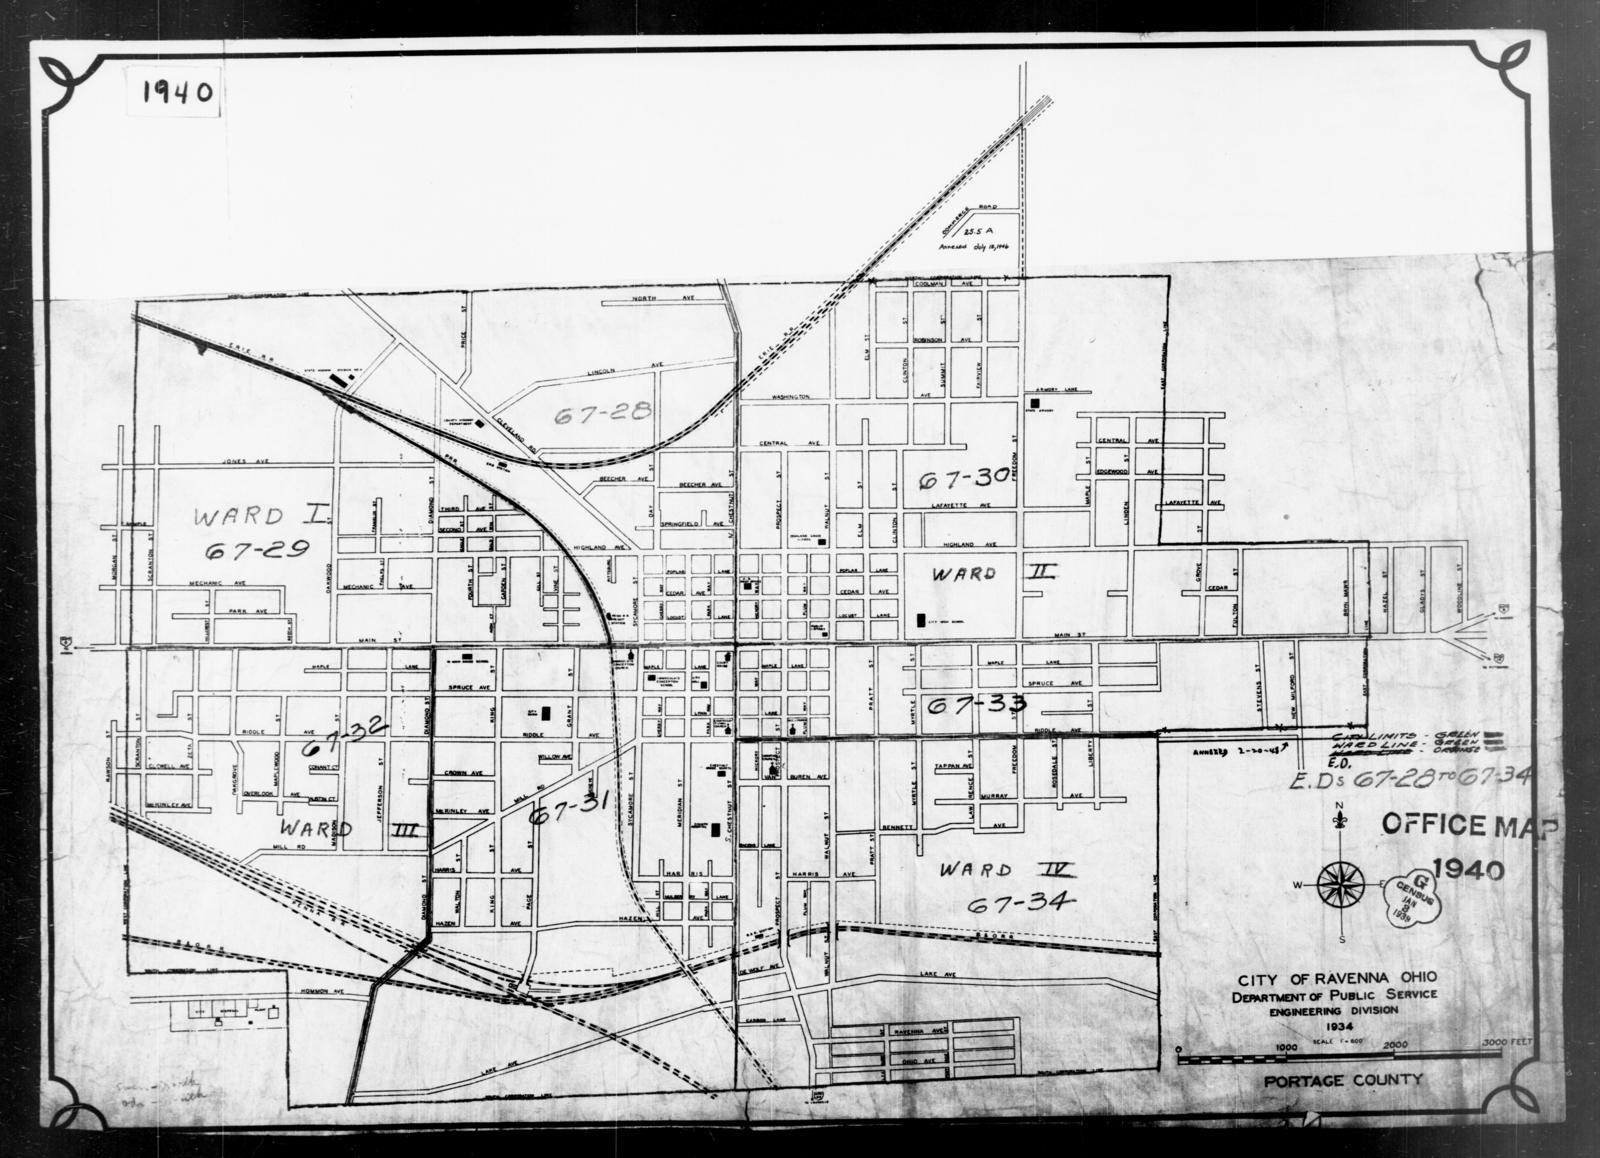 1940 Census Enumeration District Maps Ohio Portage County